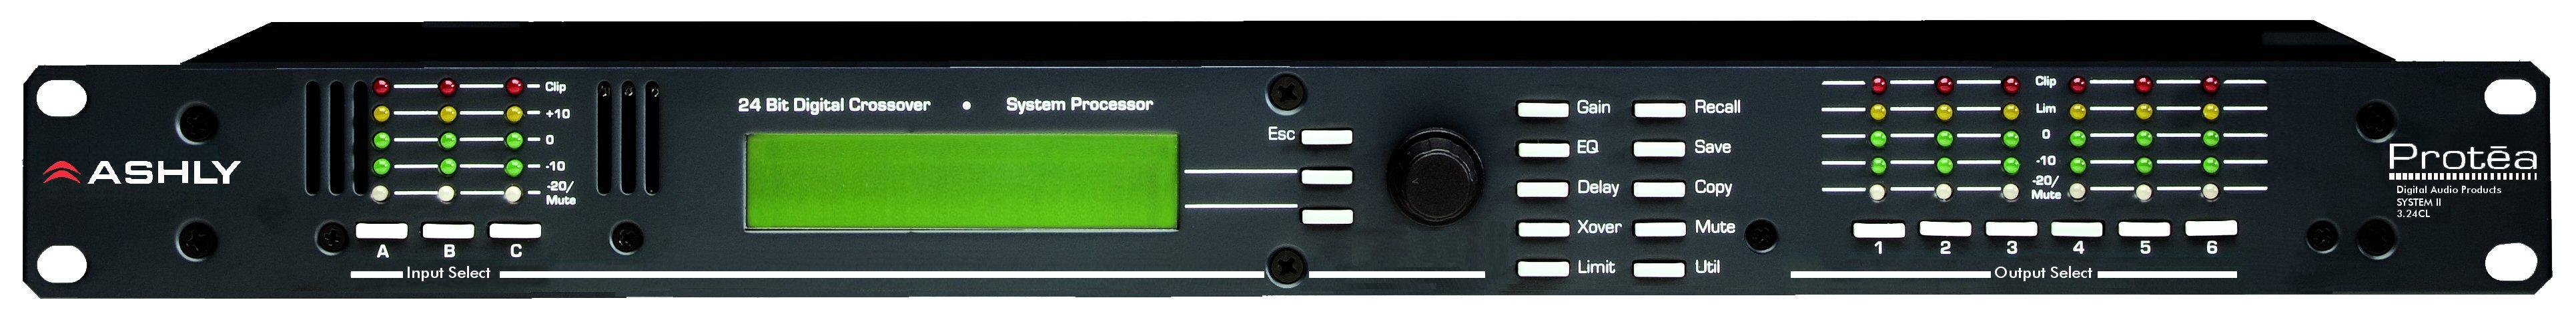 Ashly 3.24CL数字分频/系统处理器